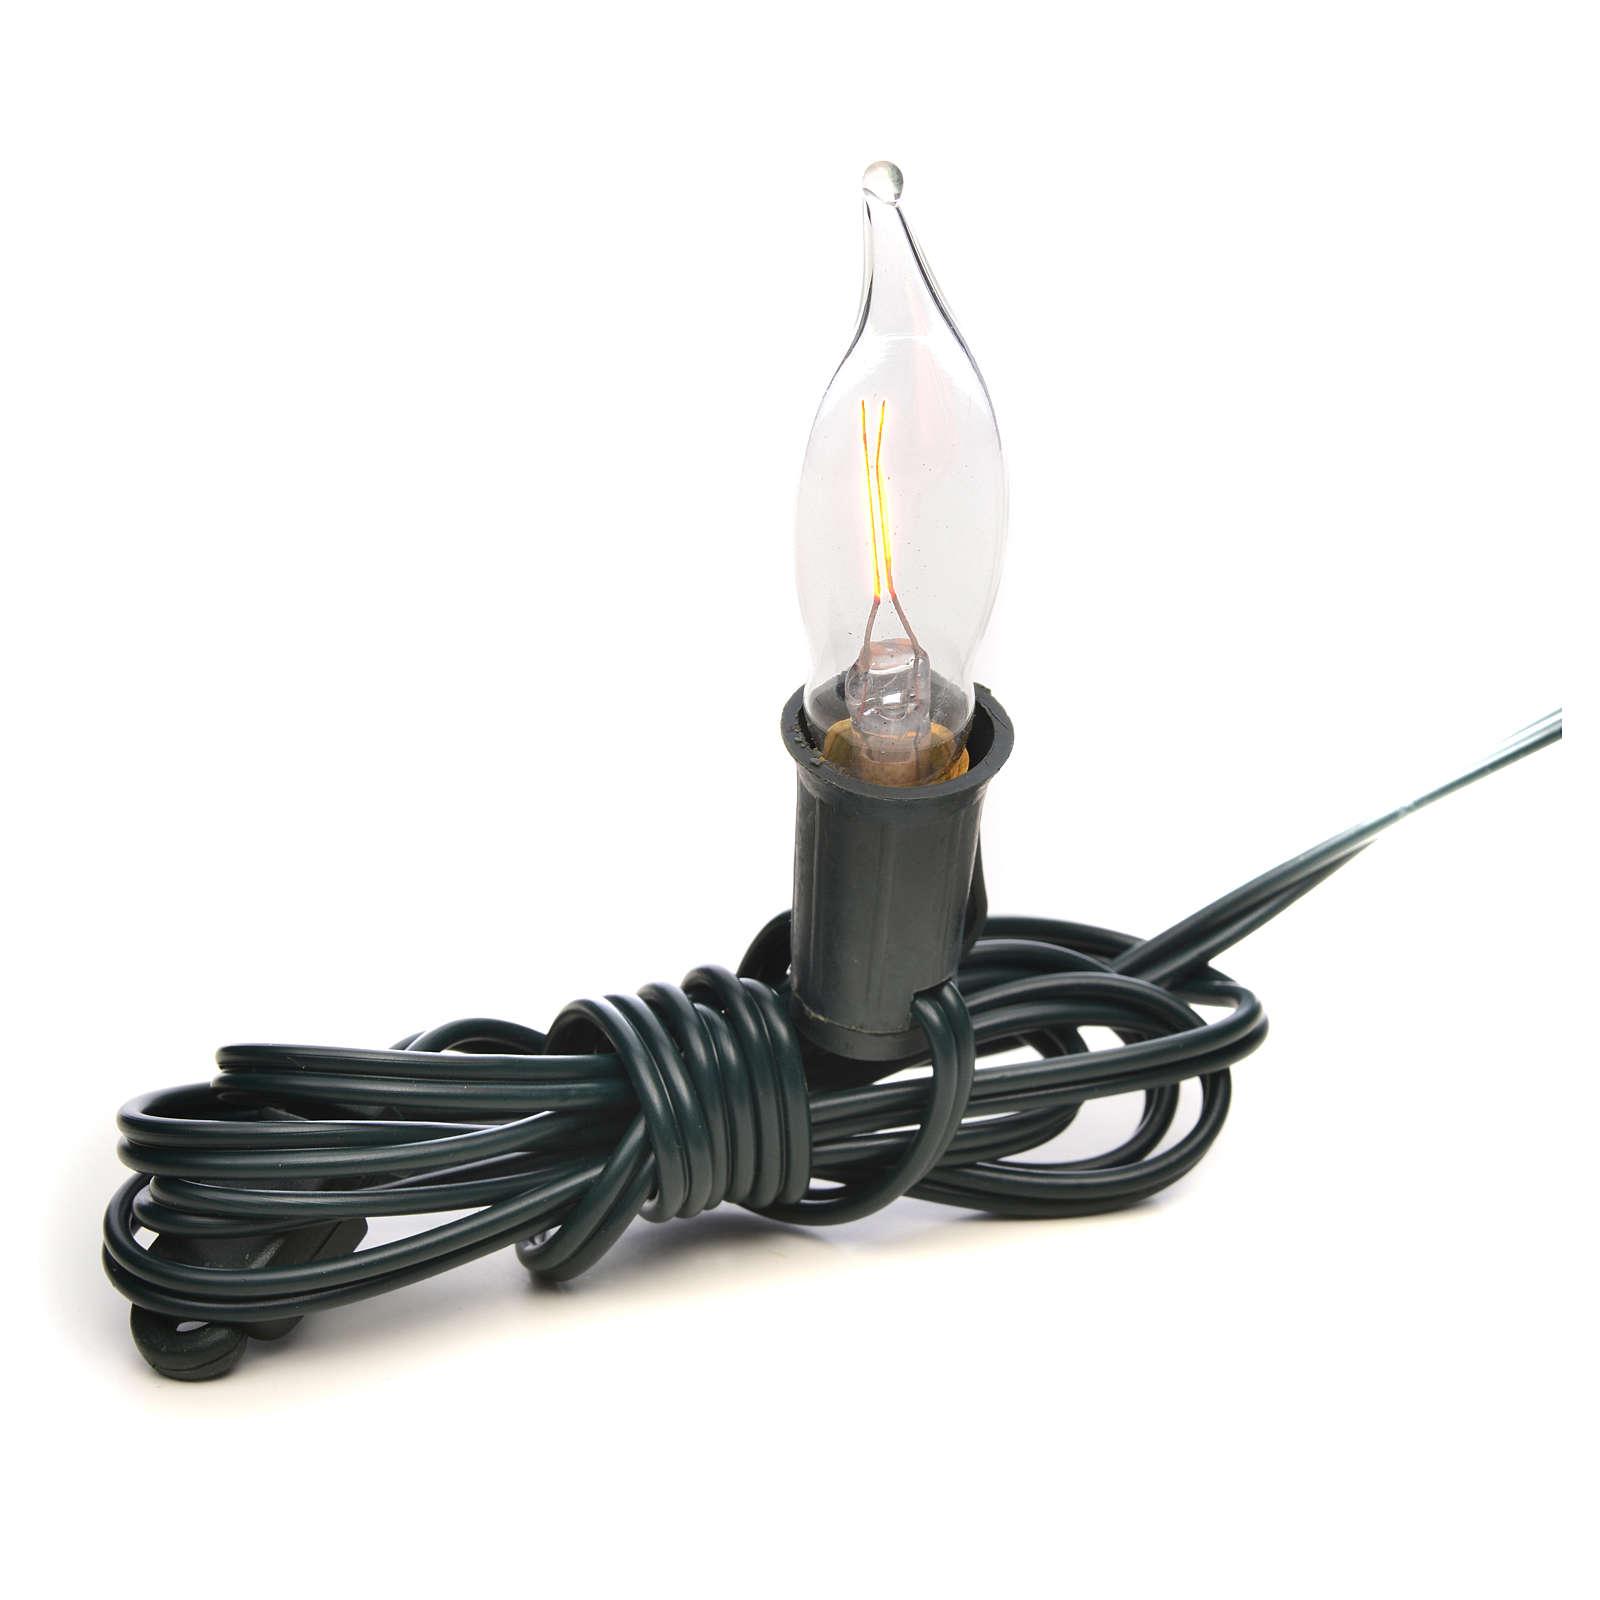 Luce fiamma bianca a corrente 1,5m cavo 4